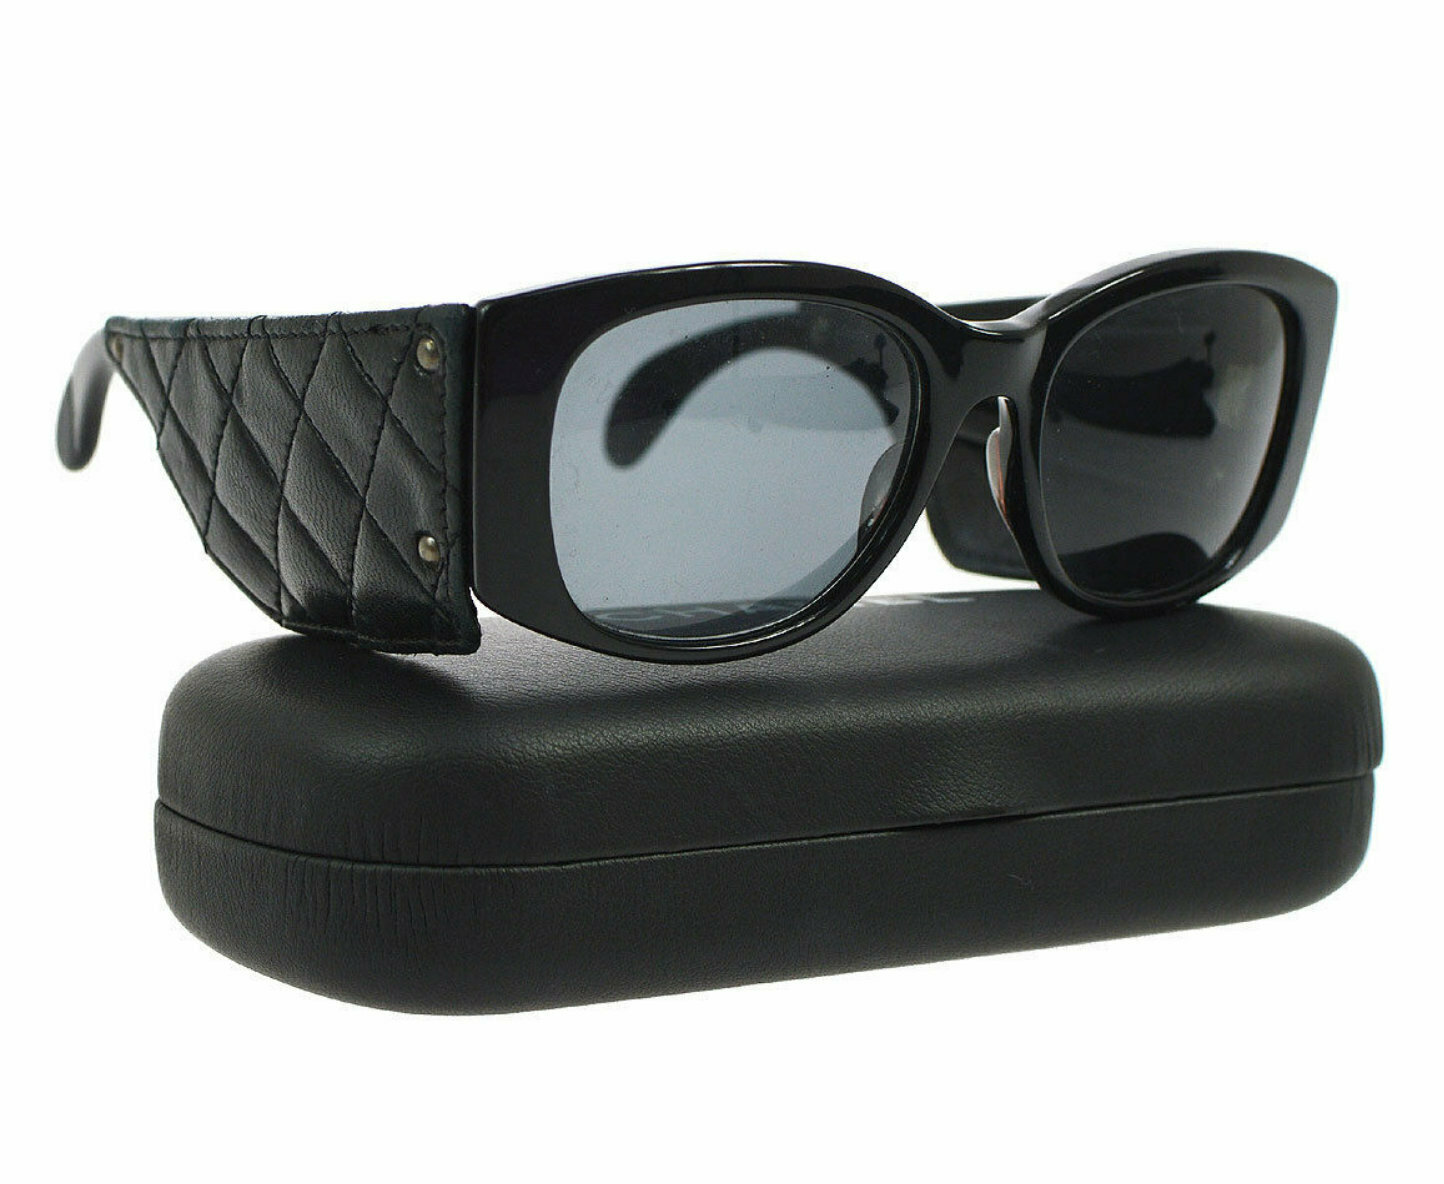 Vintage Rare CHANEL PARIS 1987 Matelasse Quilted Black Leather Frames Sunglasses